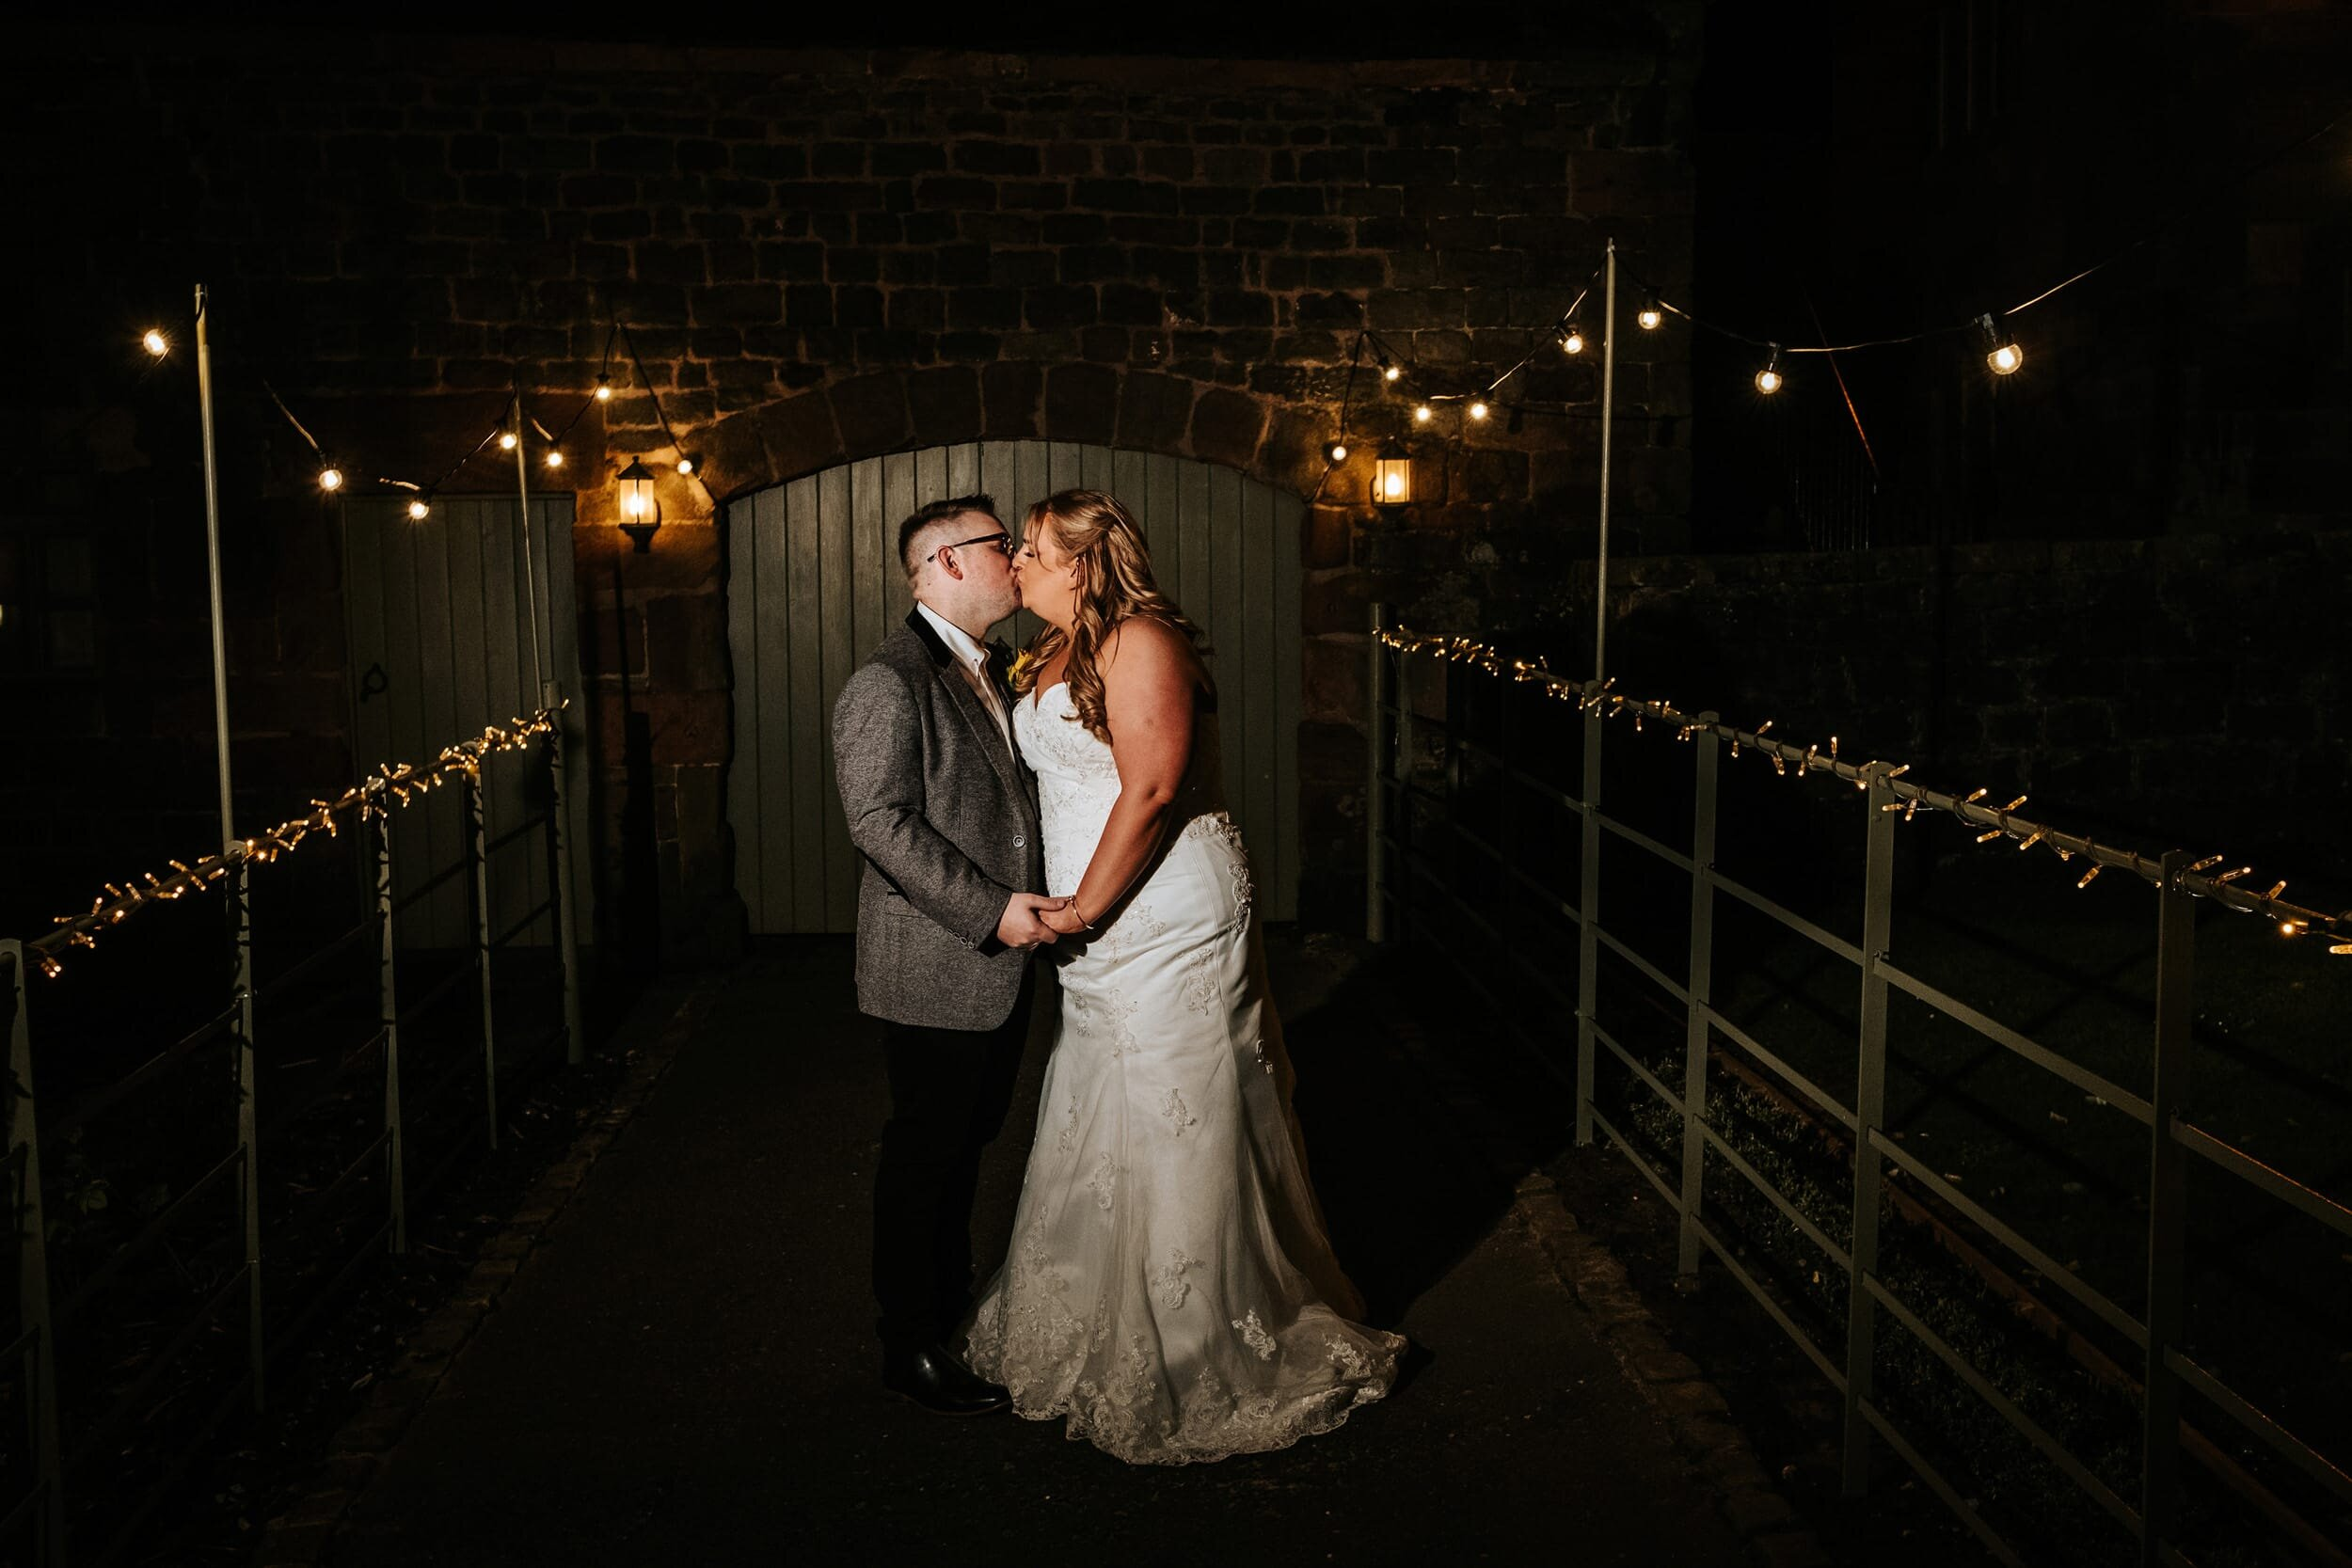 The Ashes Barns Wedding Photographer00221.jpg